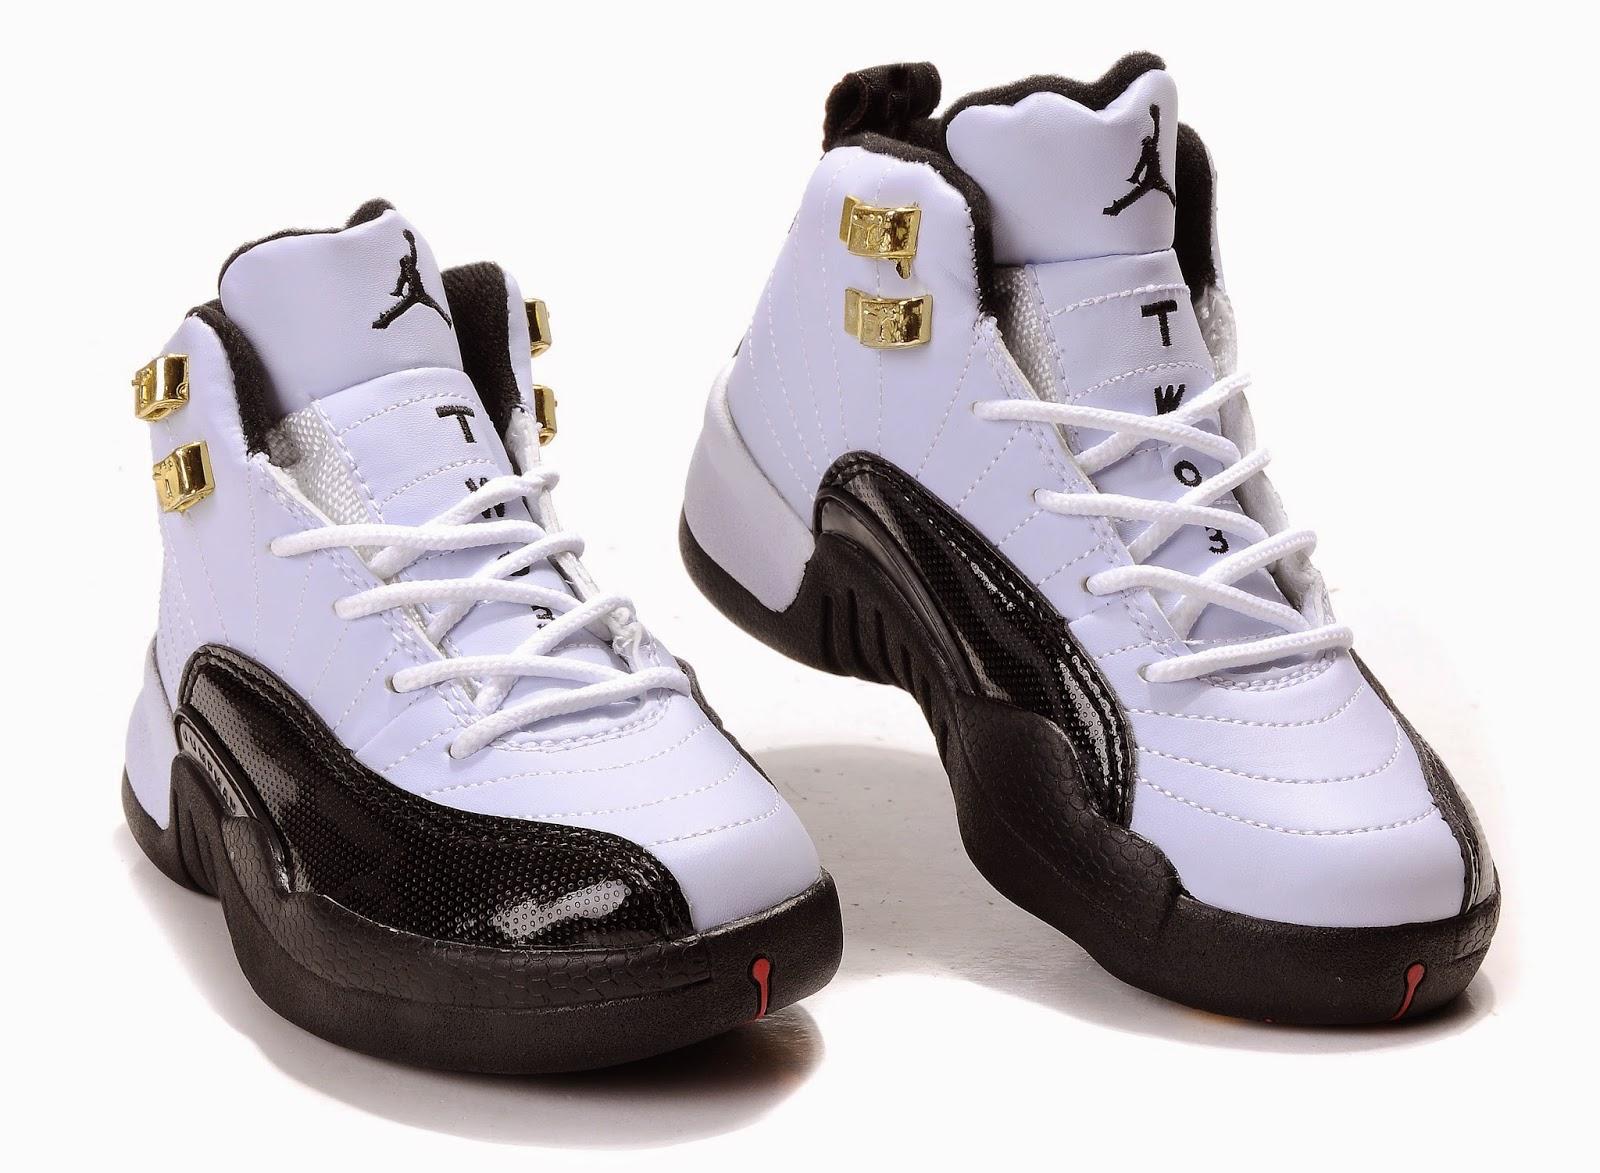 Nn 7 N >> Replica Cheap Kids Nike Shoes online Replica Kids Jordan Shoes Fake Discounts Kids Nikes For ...